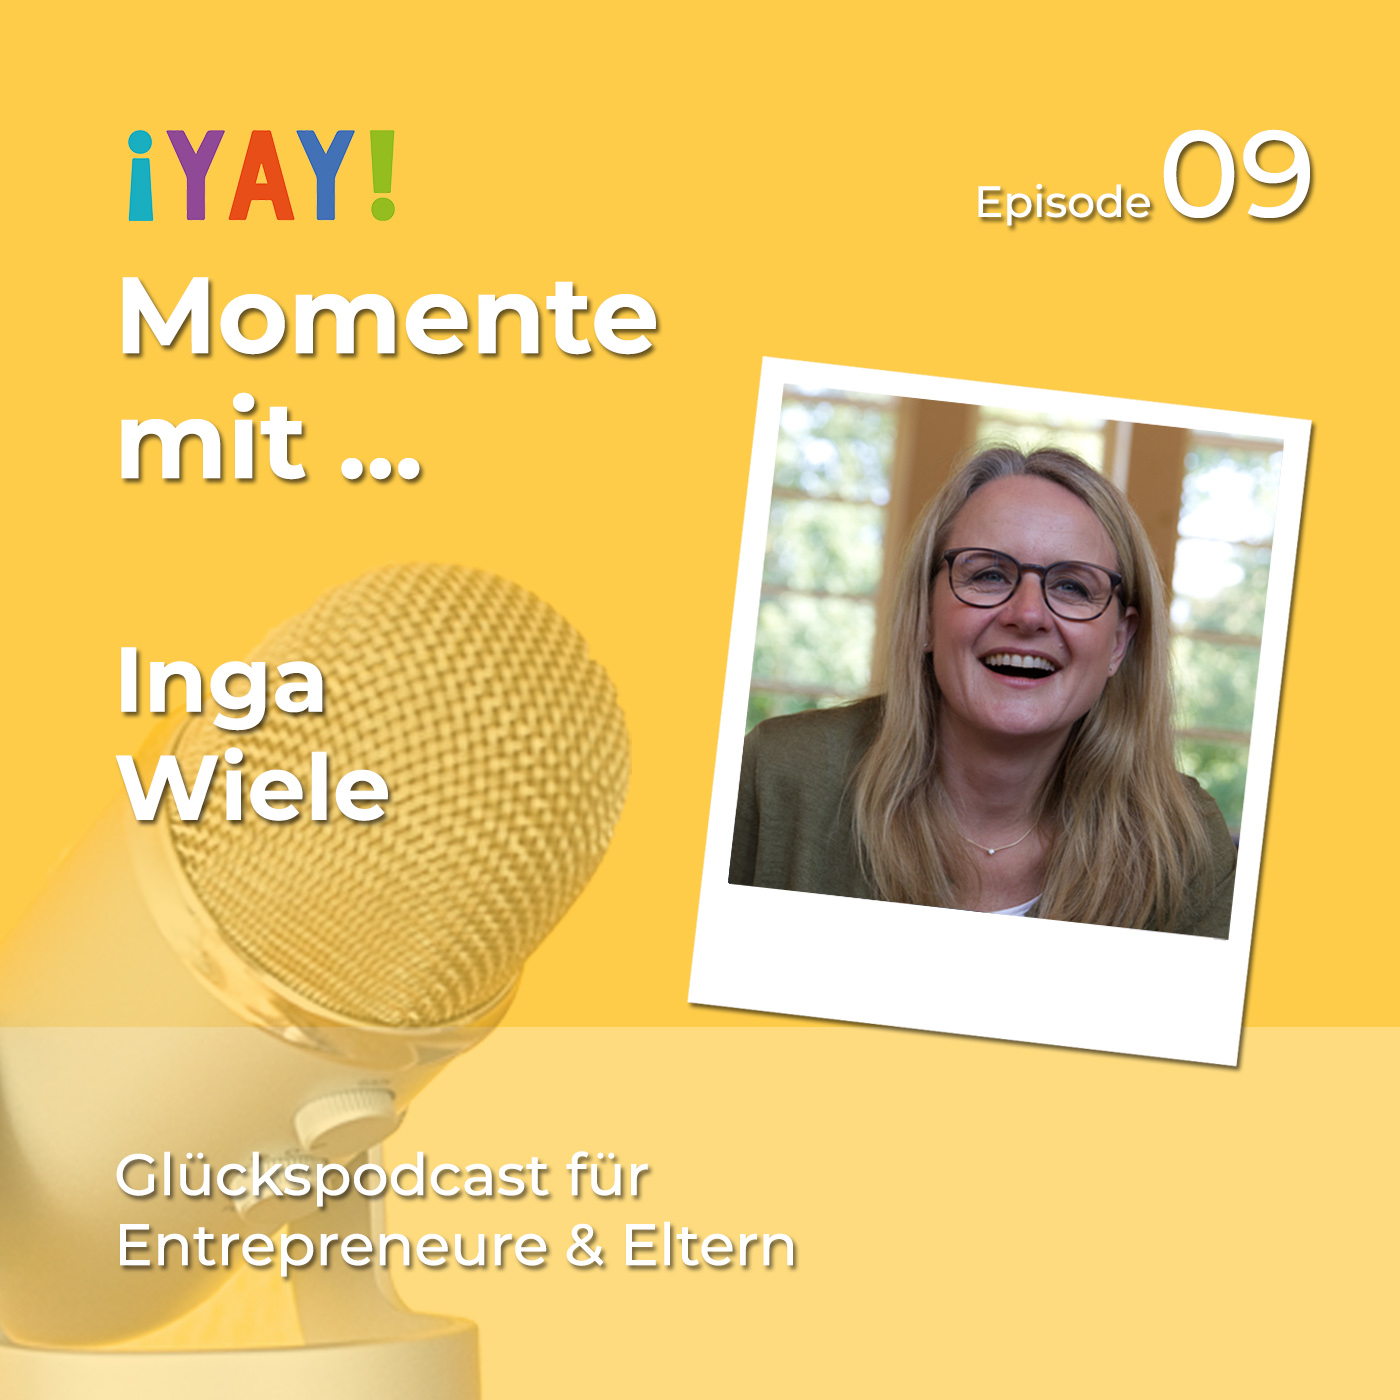 Episode 09: YAY-Momente mit... Inga Wiele